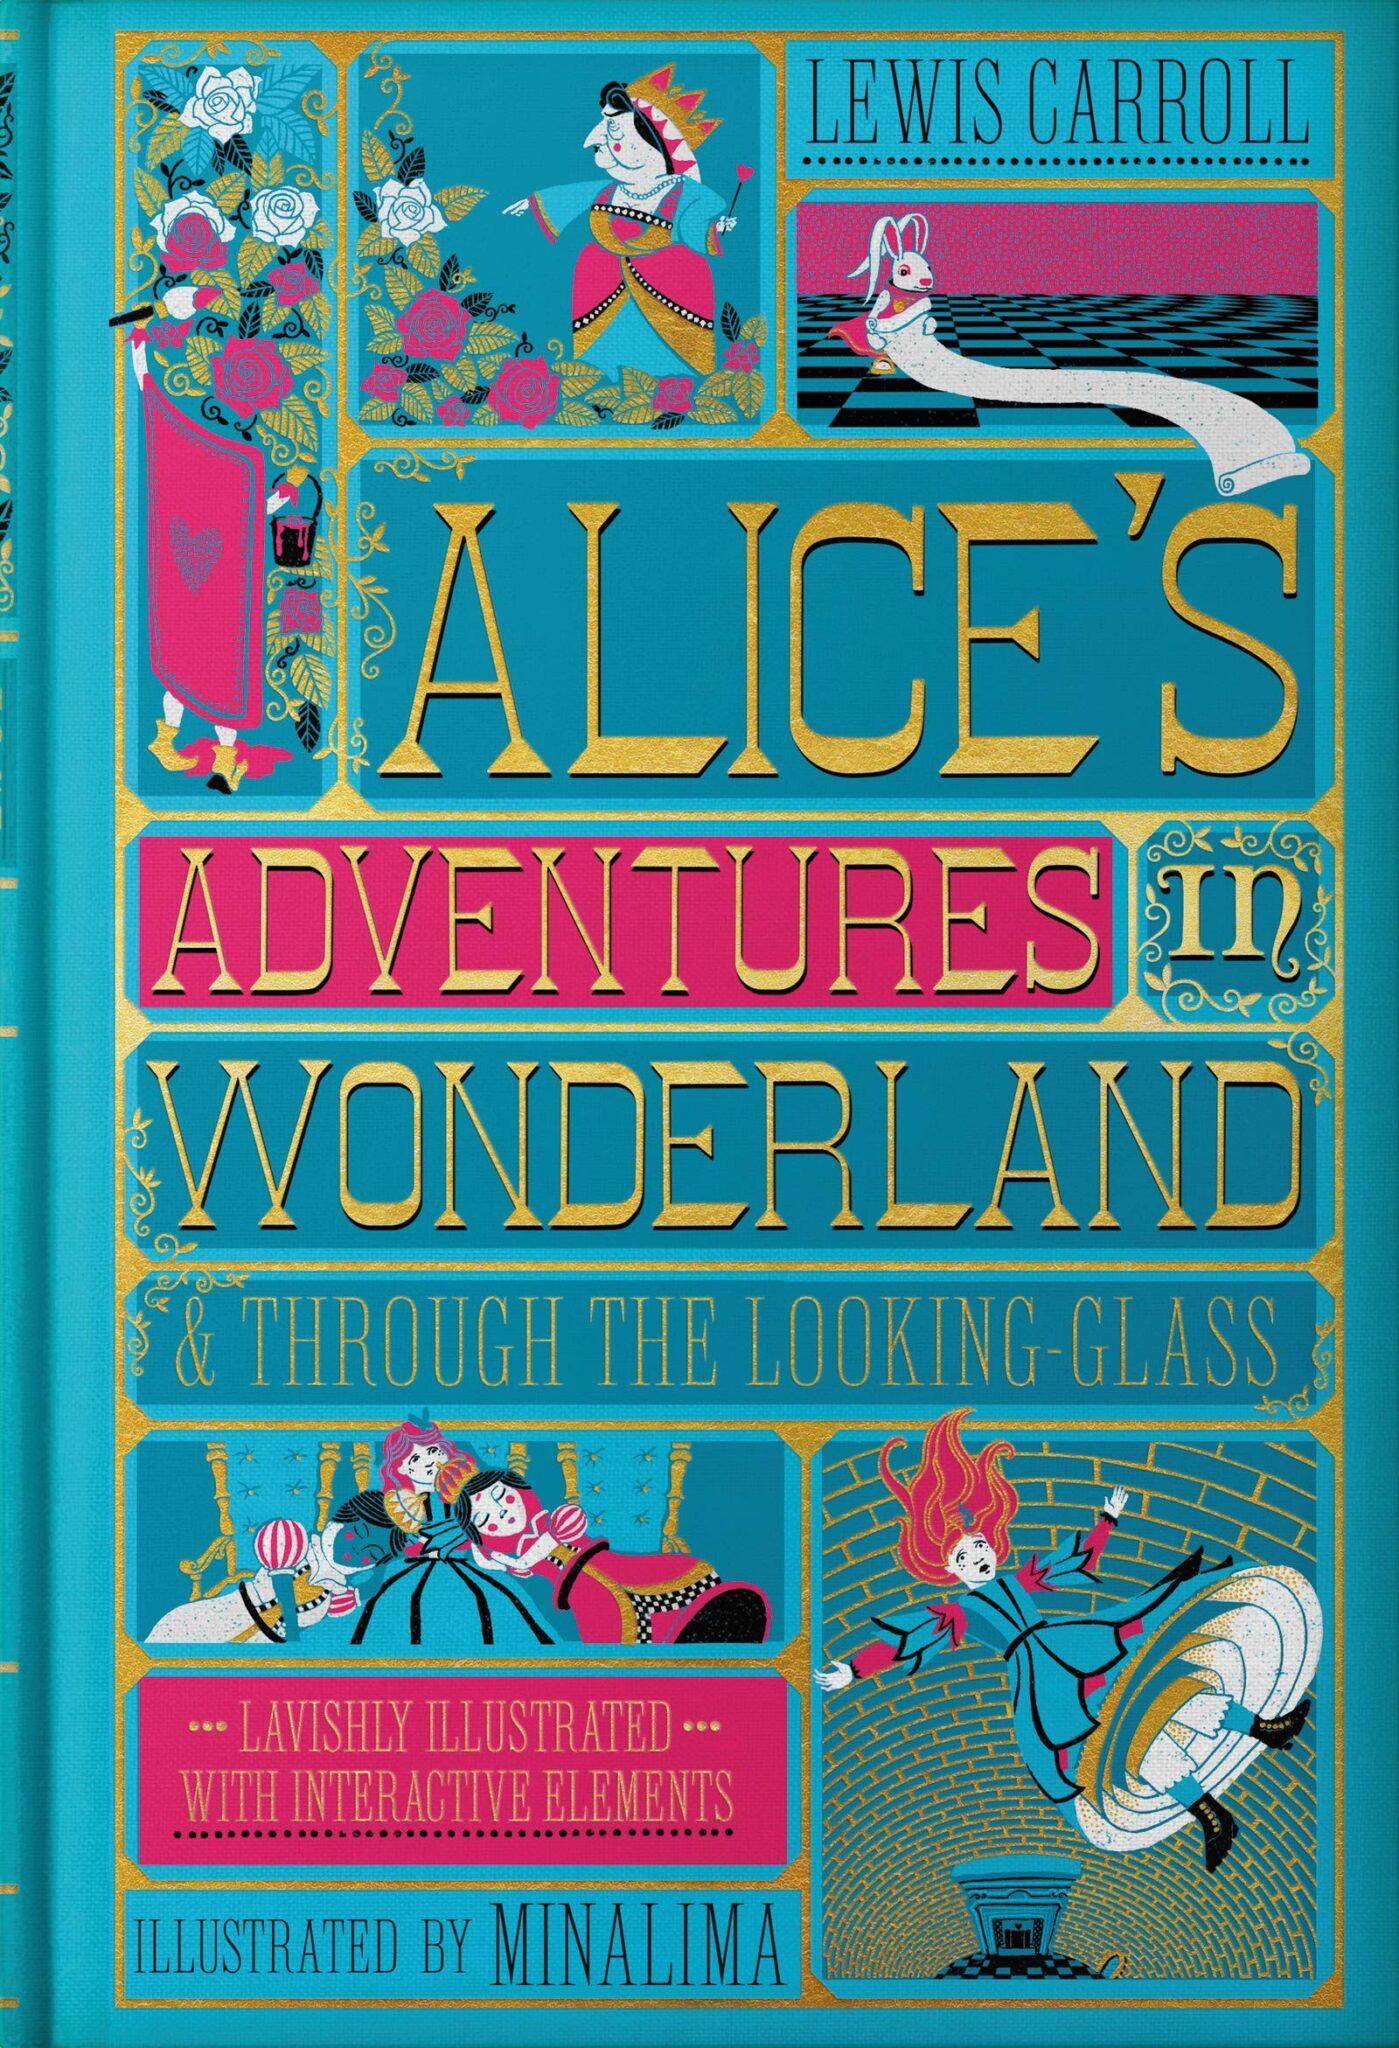 Alice in Wonderland MinaLima cover